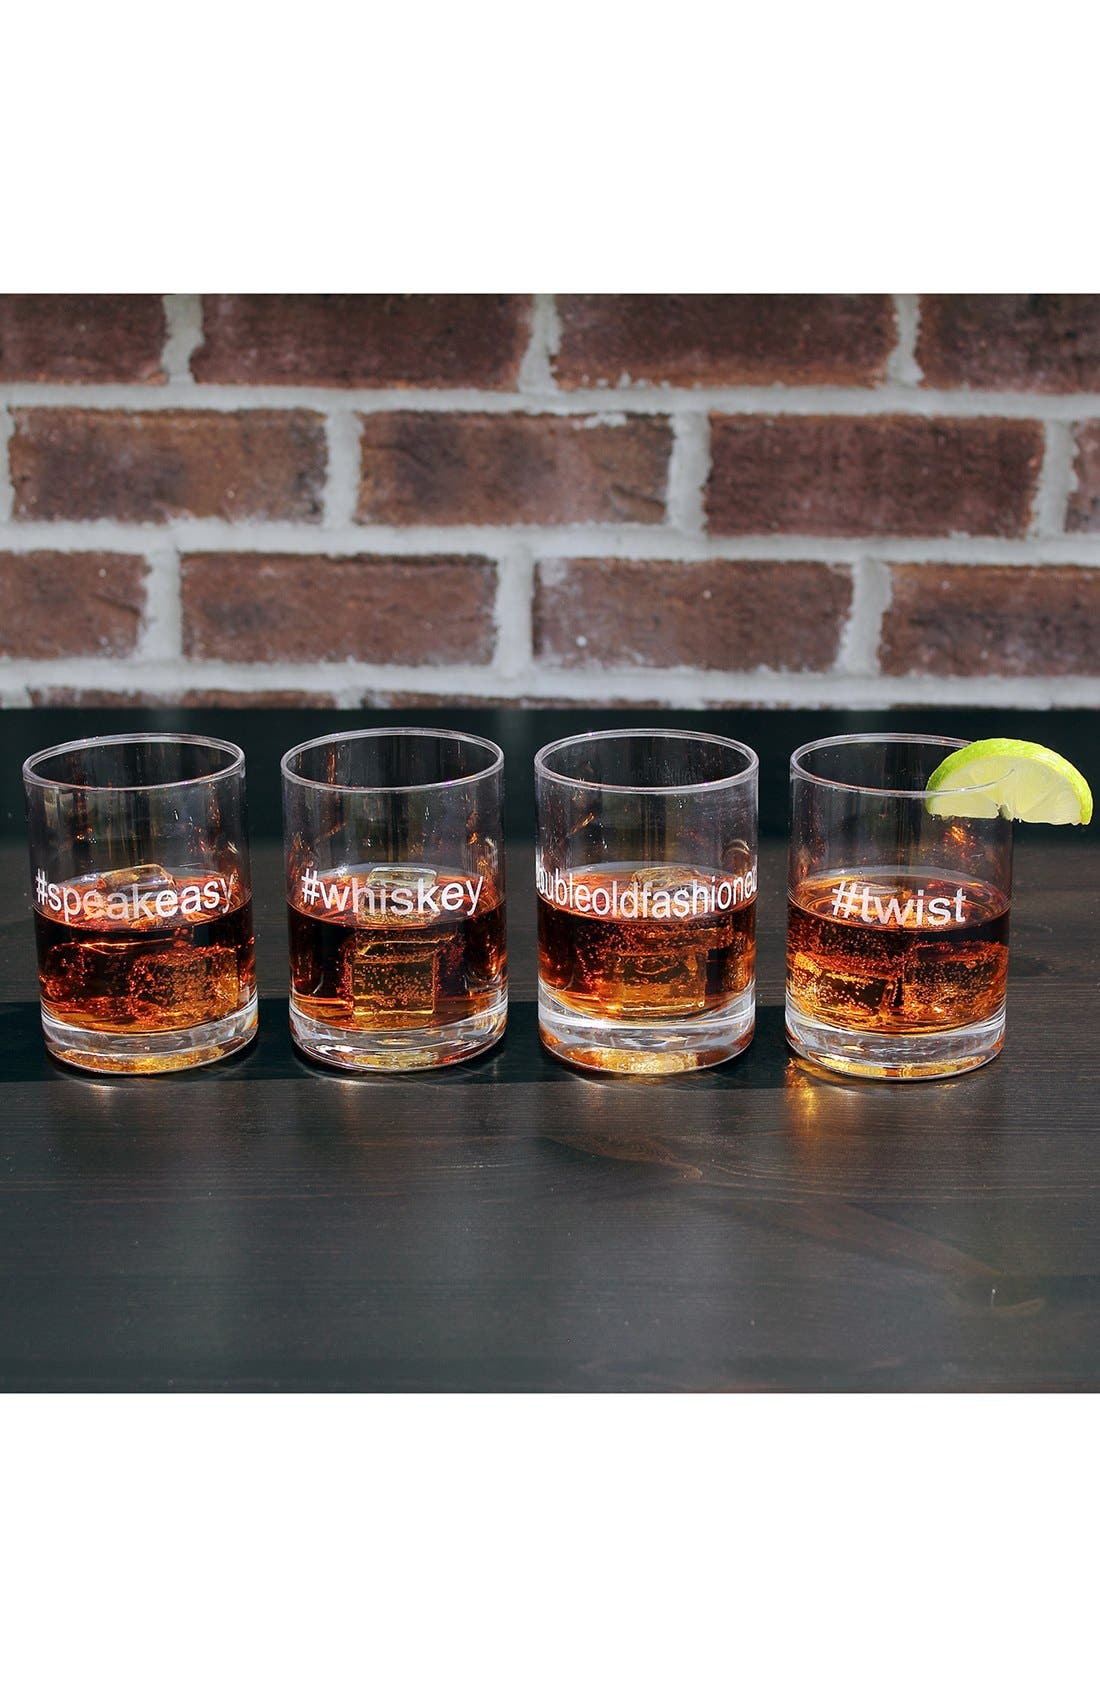 Main Image - '#speakeasy #whiskey #doubleoldfashioned #twist' Etched Double Old Fashioned Glasses (Set of 4)